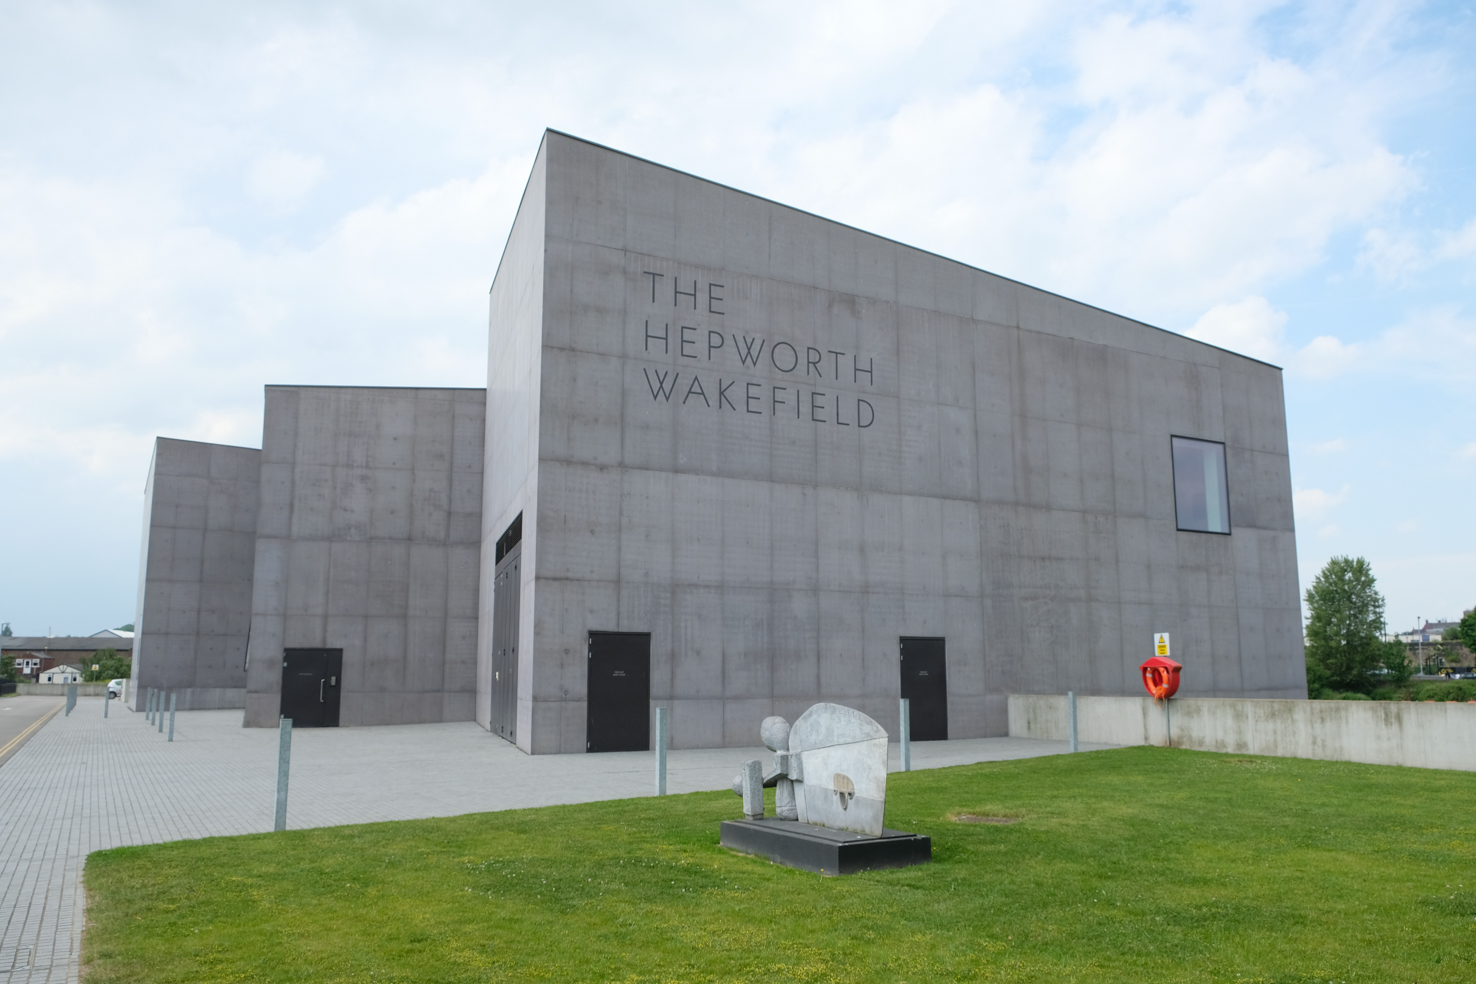 01 The Hepworth Wakefield